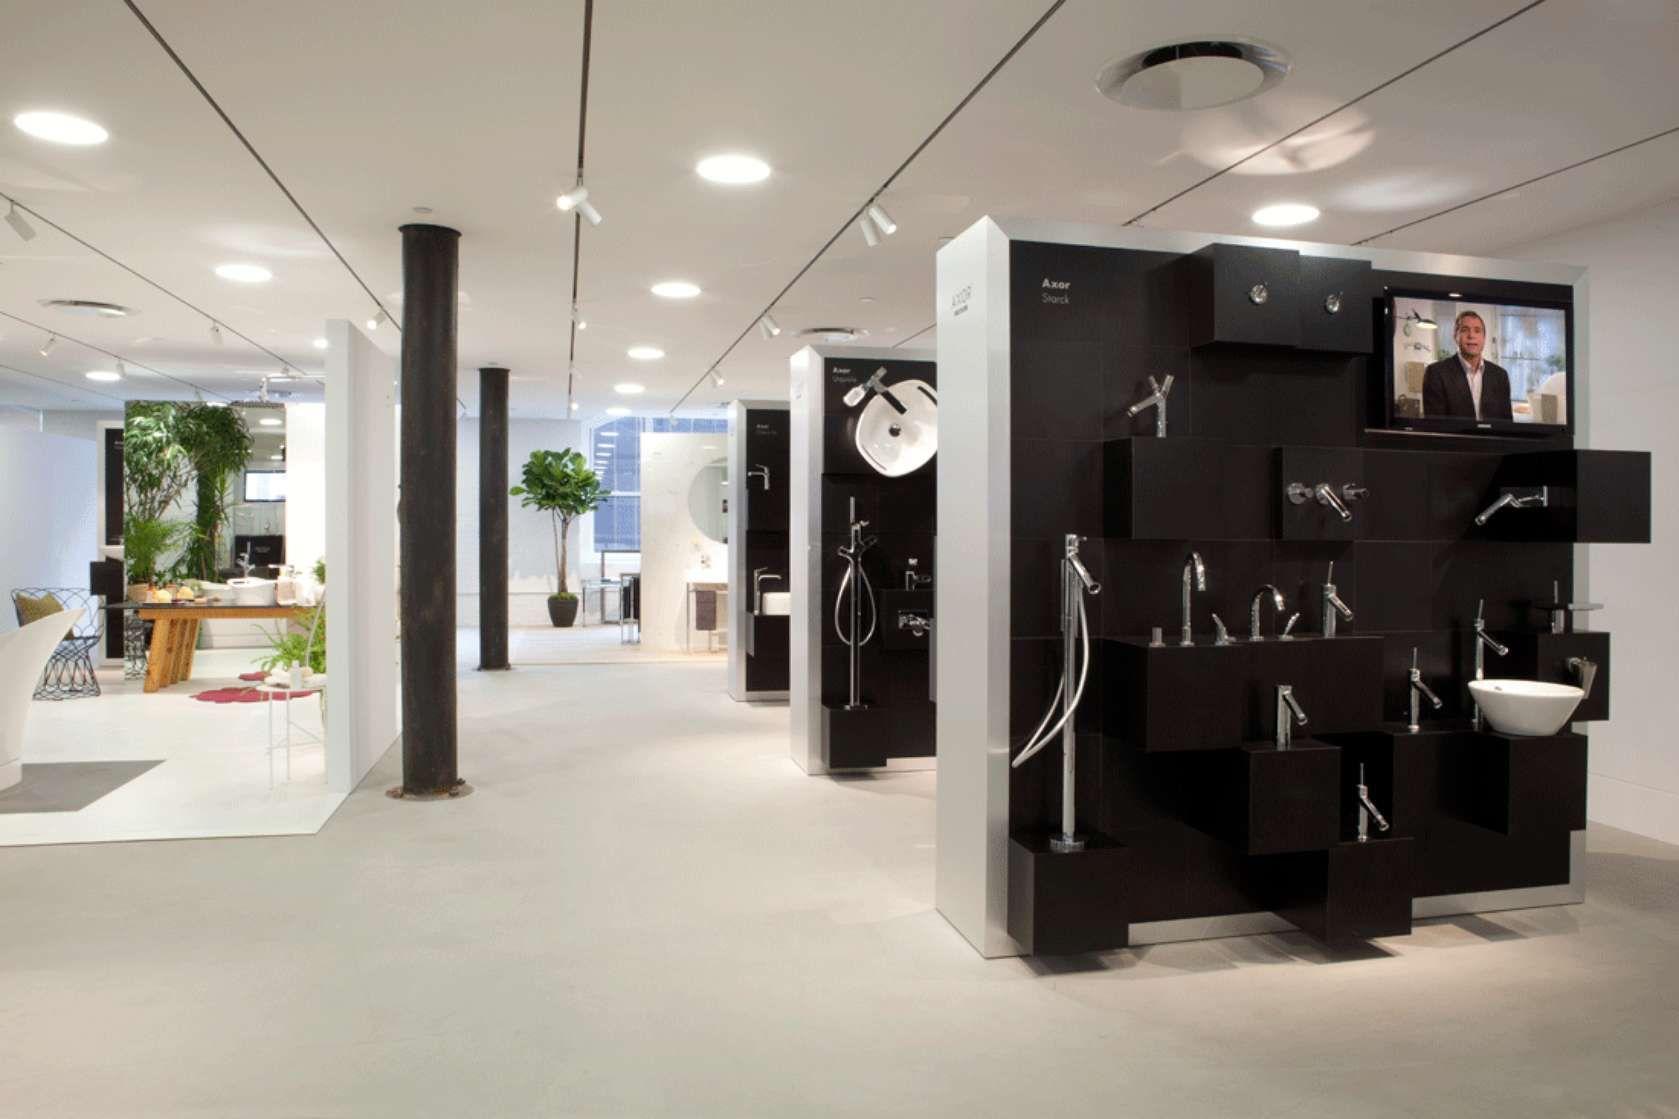 axor nyc showroom | display | pinterest | showroom, display and